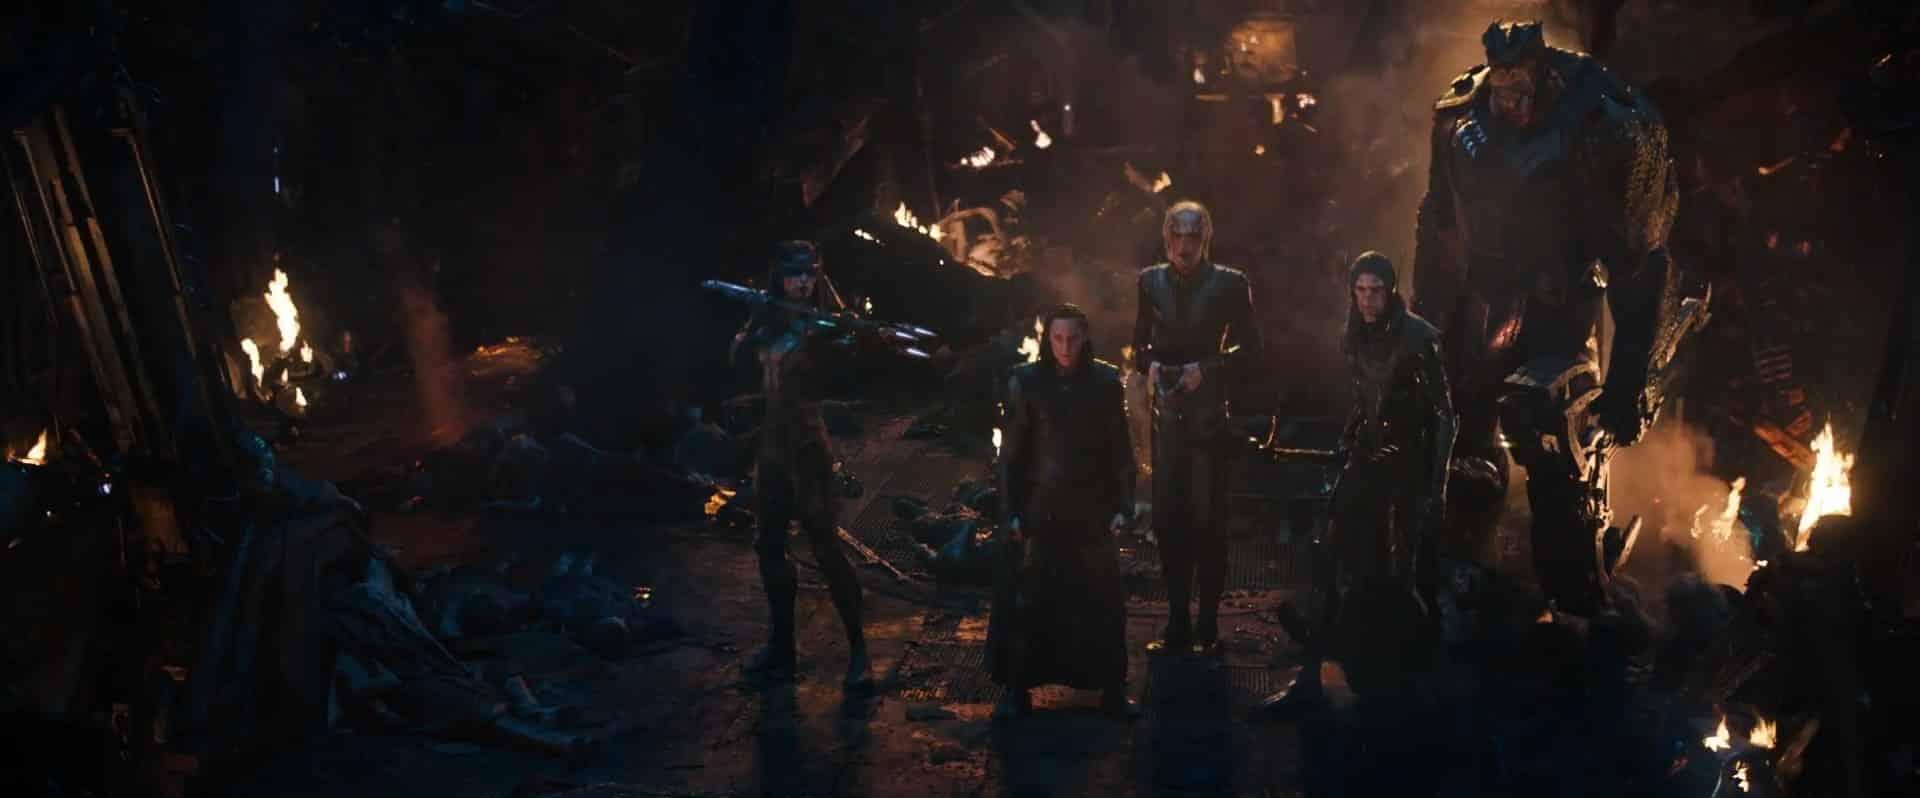 La orden negra de Thanos. black order